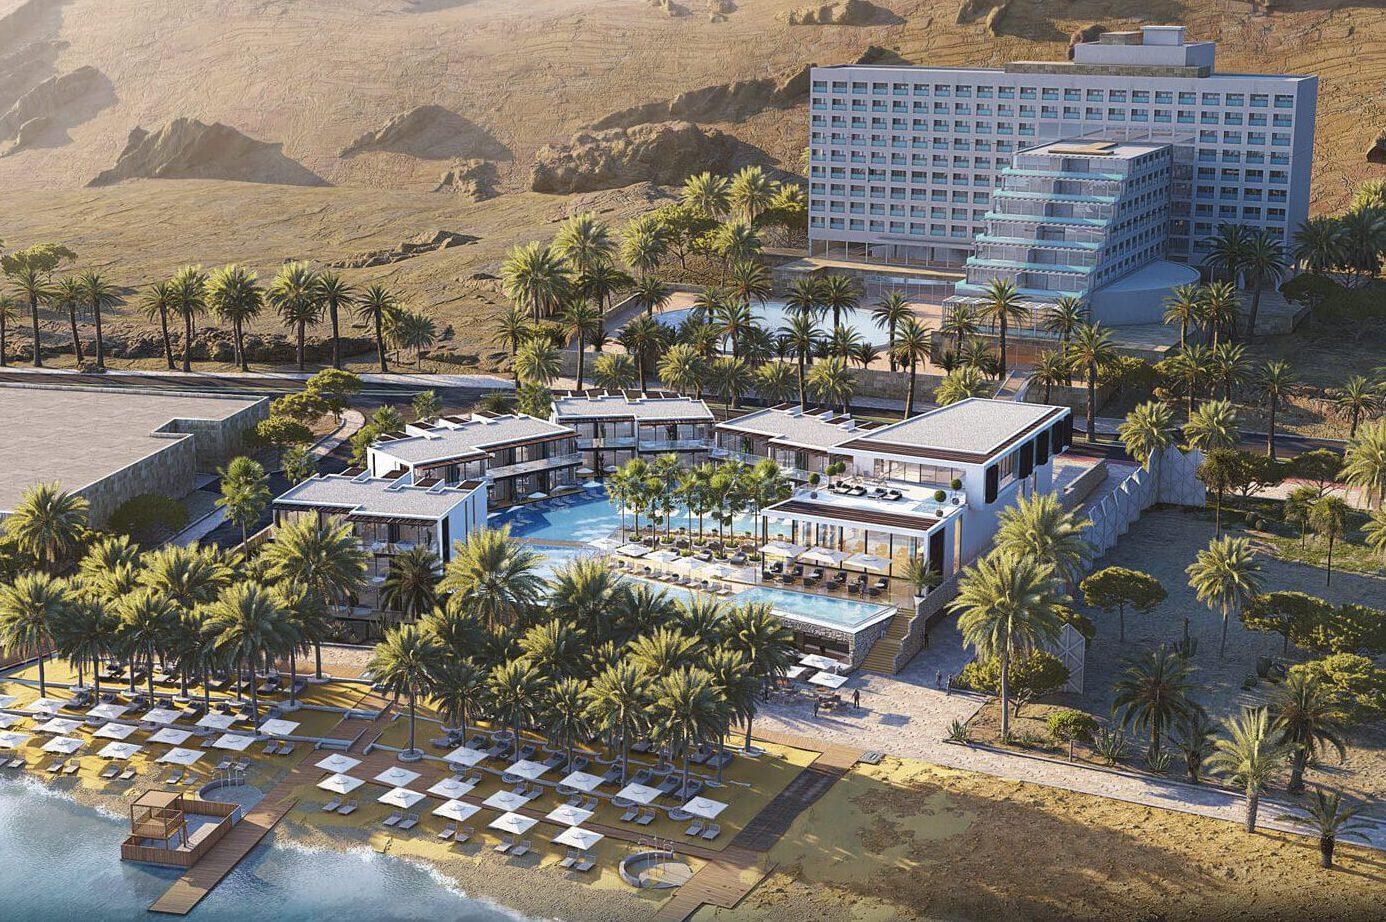 ISROTEL DEAD SEA HOTEL NEW WING